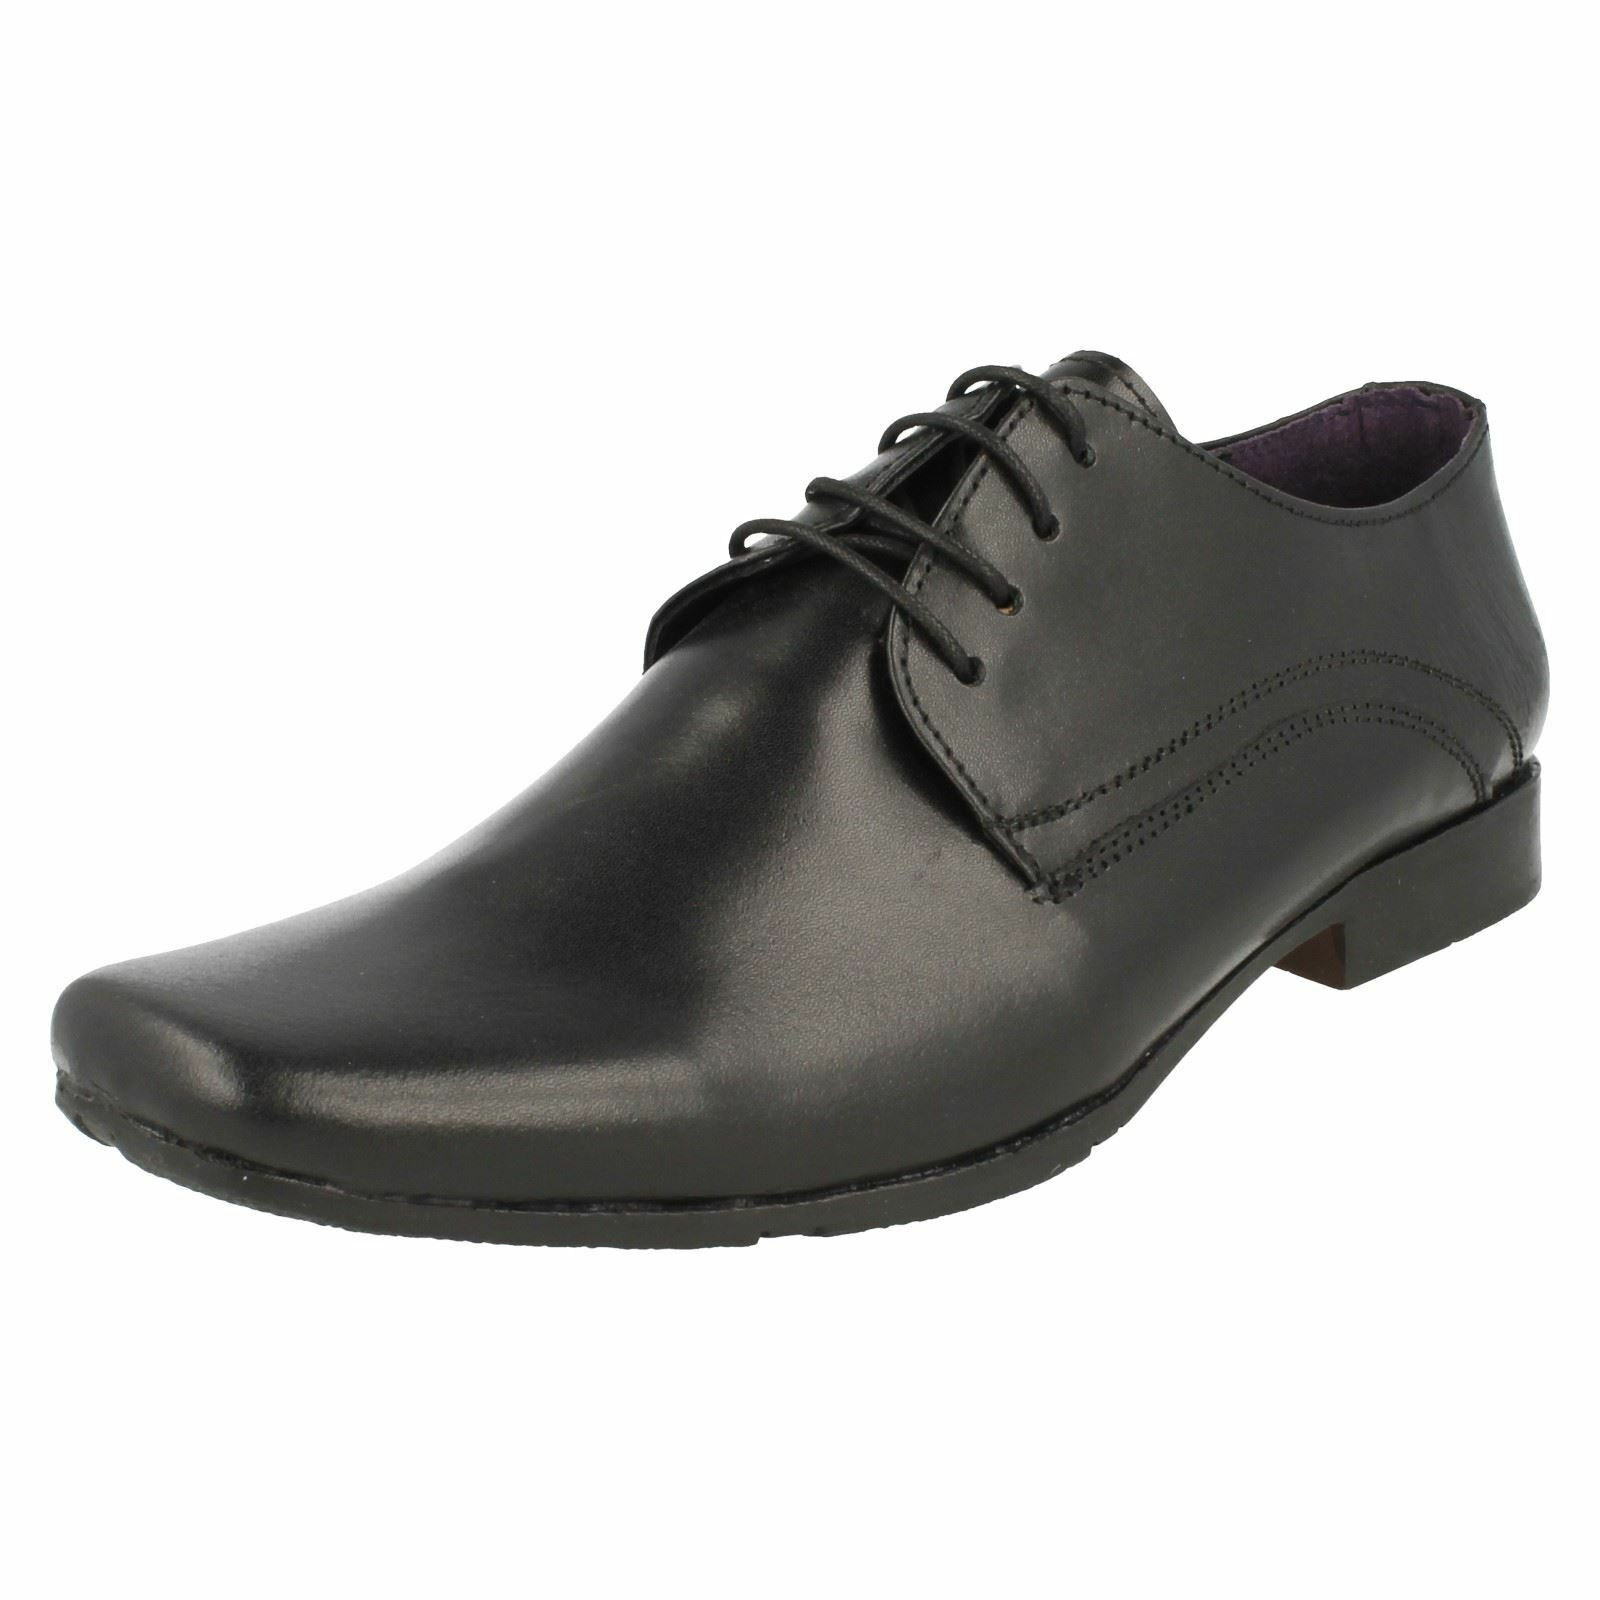 Mens PSL Smart Formal Lace Up shoes 209682B